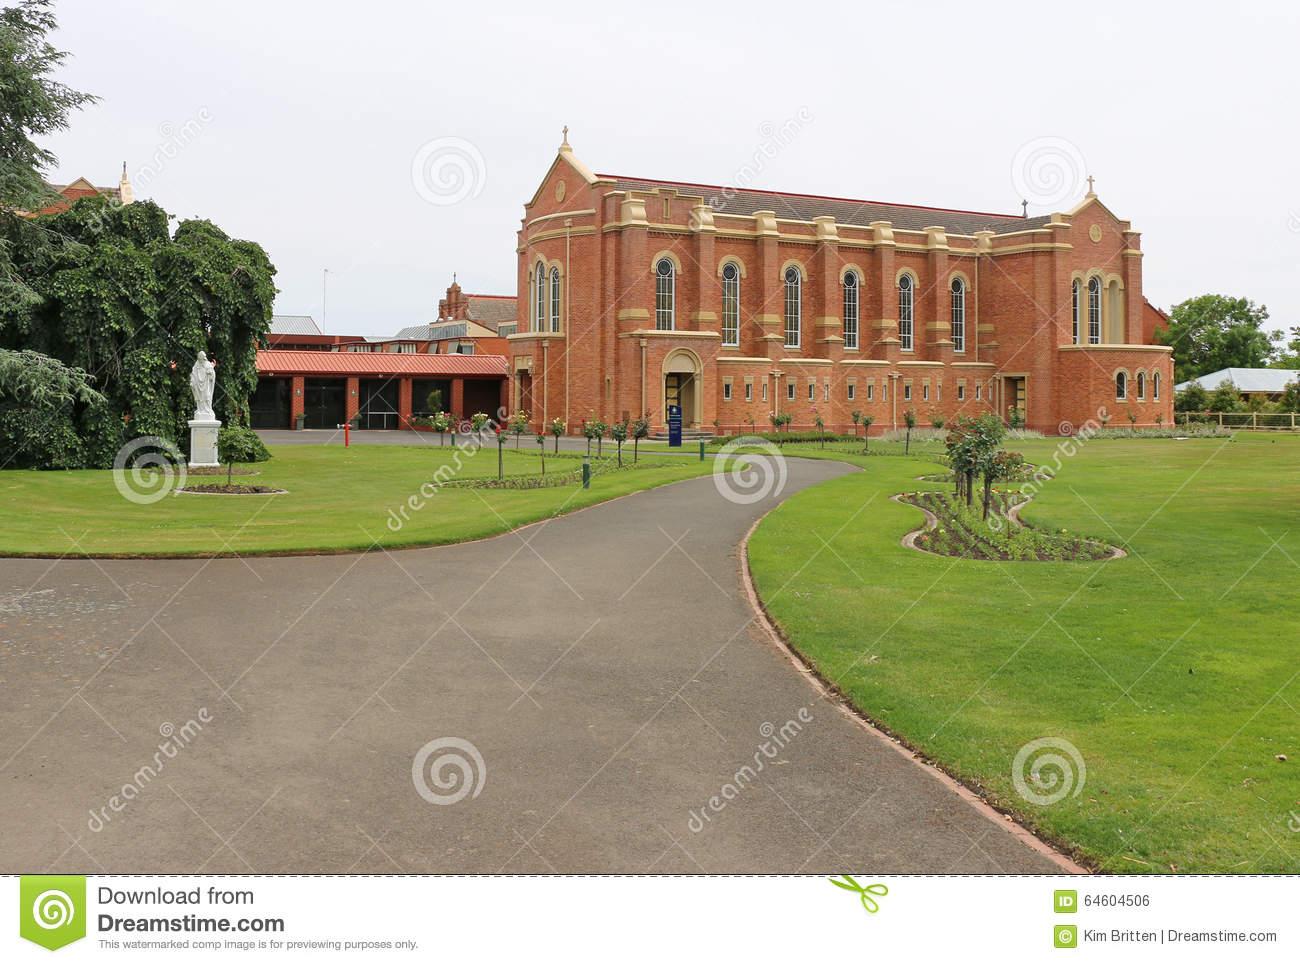 Free st patricks catholic school clipart.